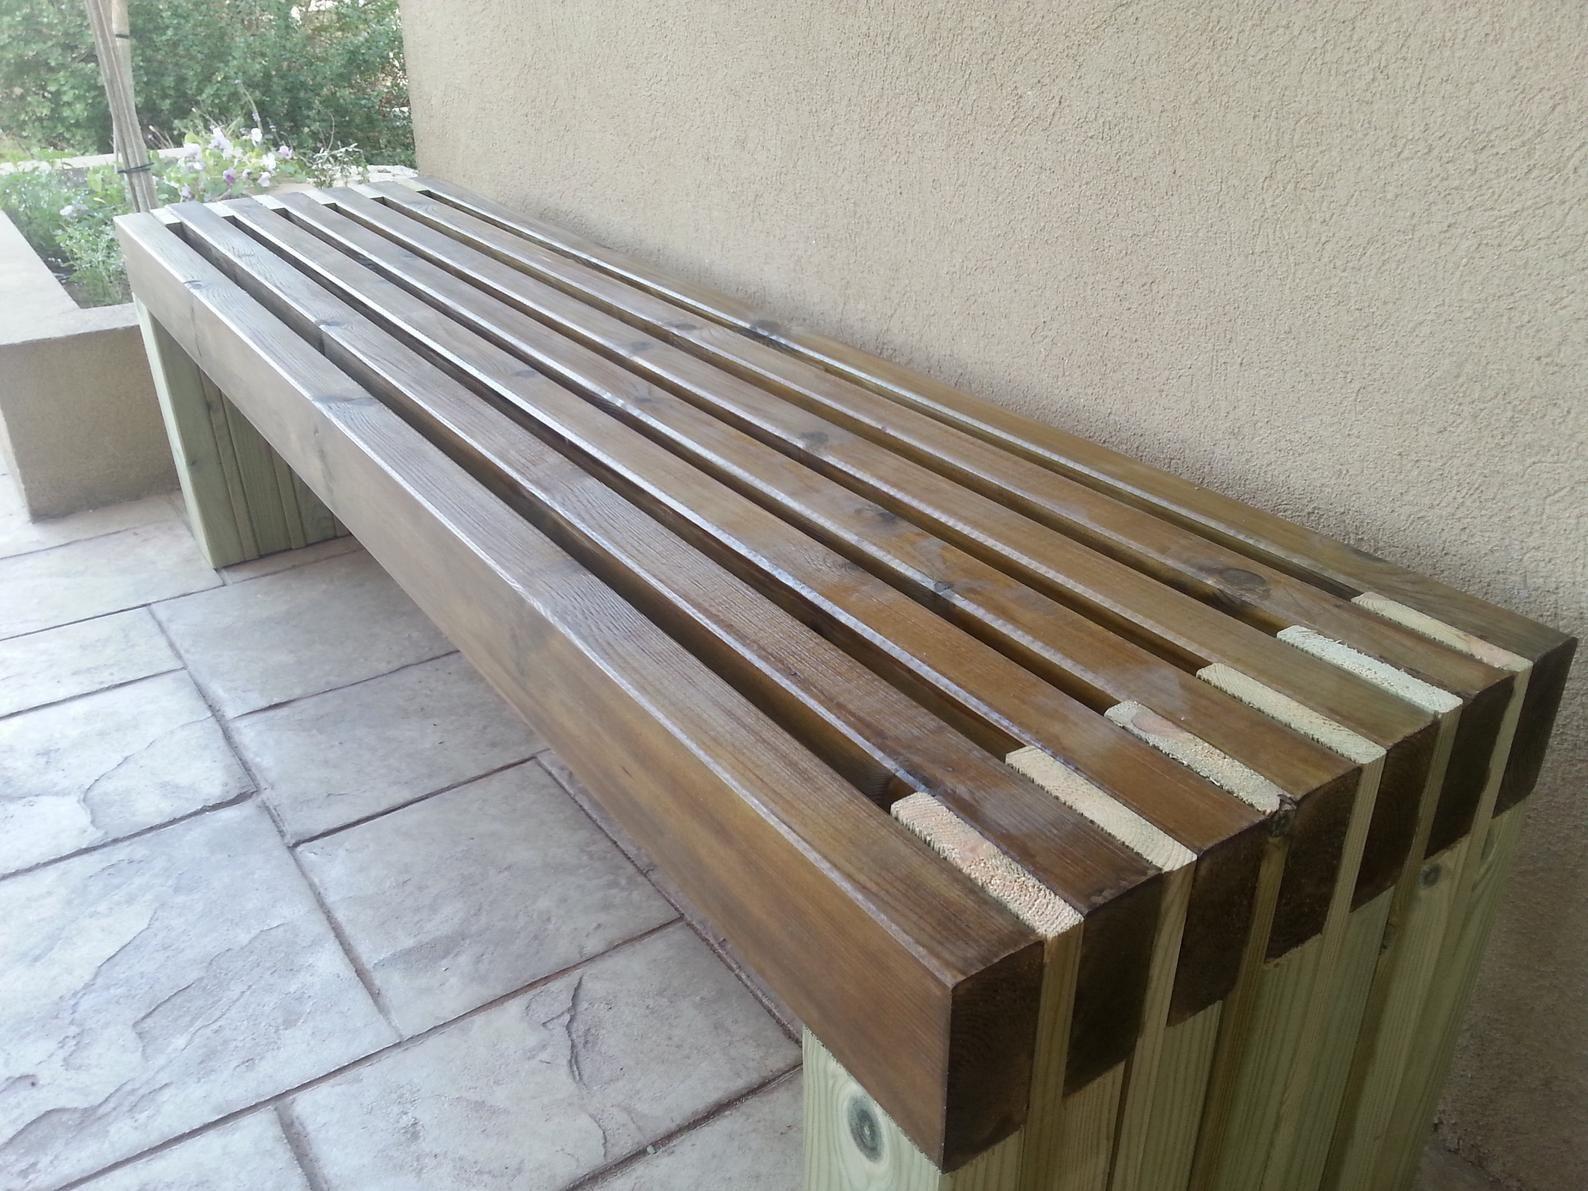 Simple Bench Plans Outdoor Furniture DIY 2x4 lumber Patio Furniture